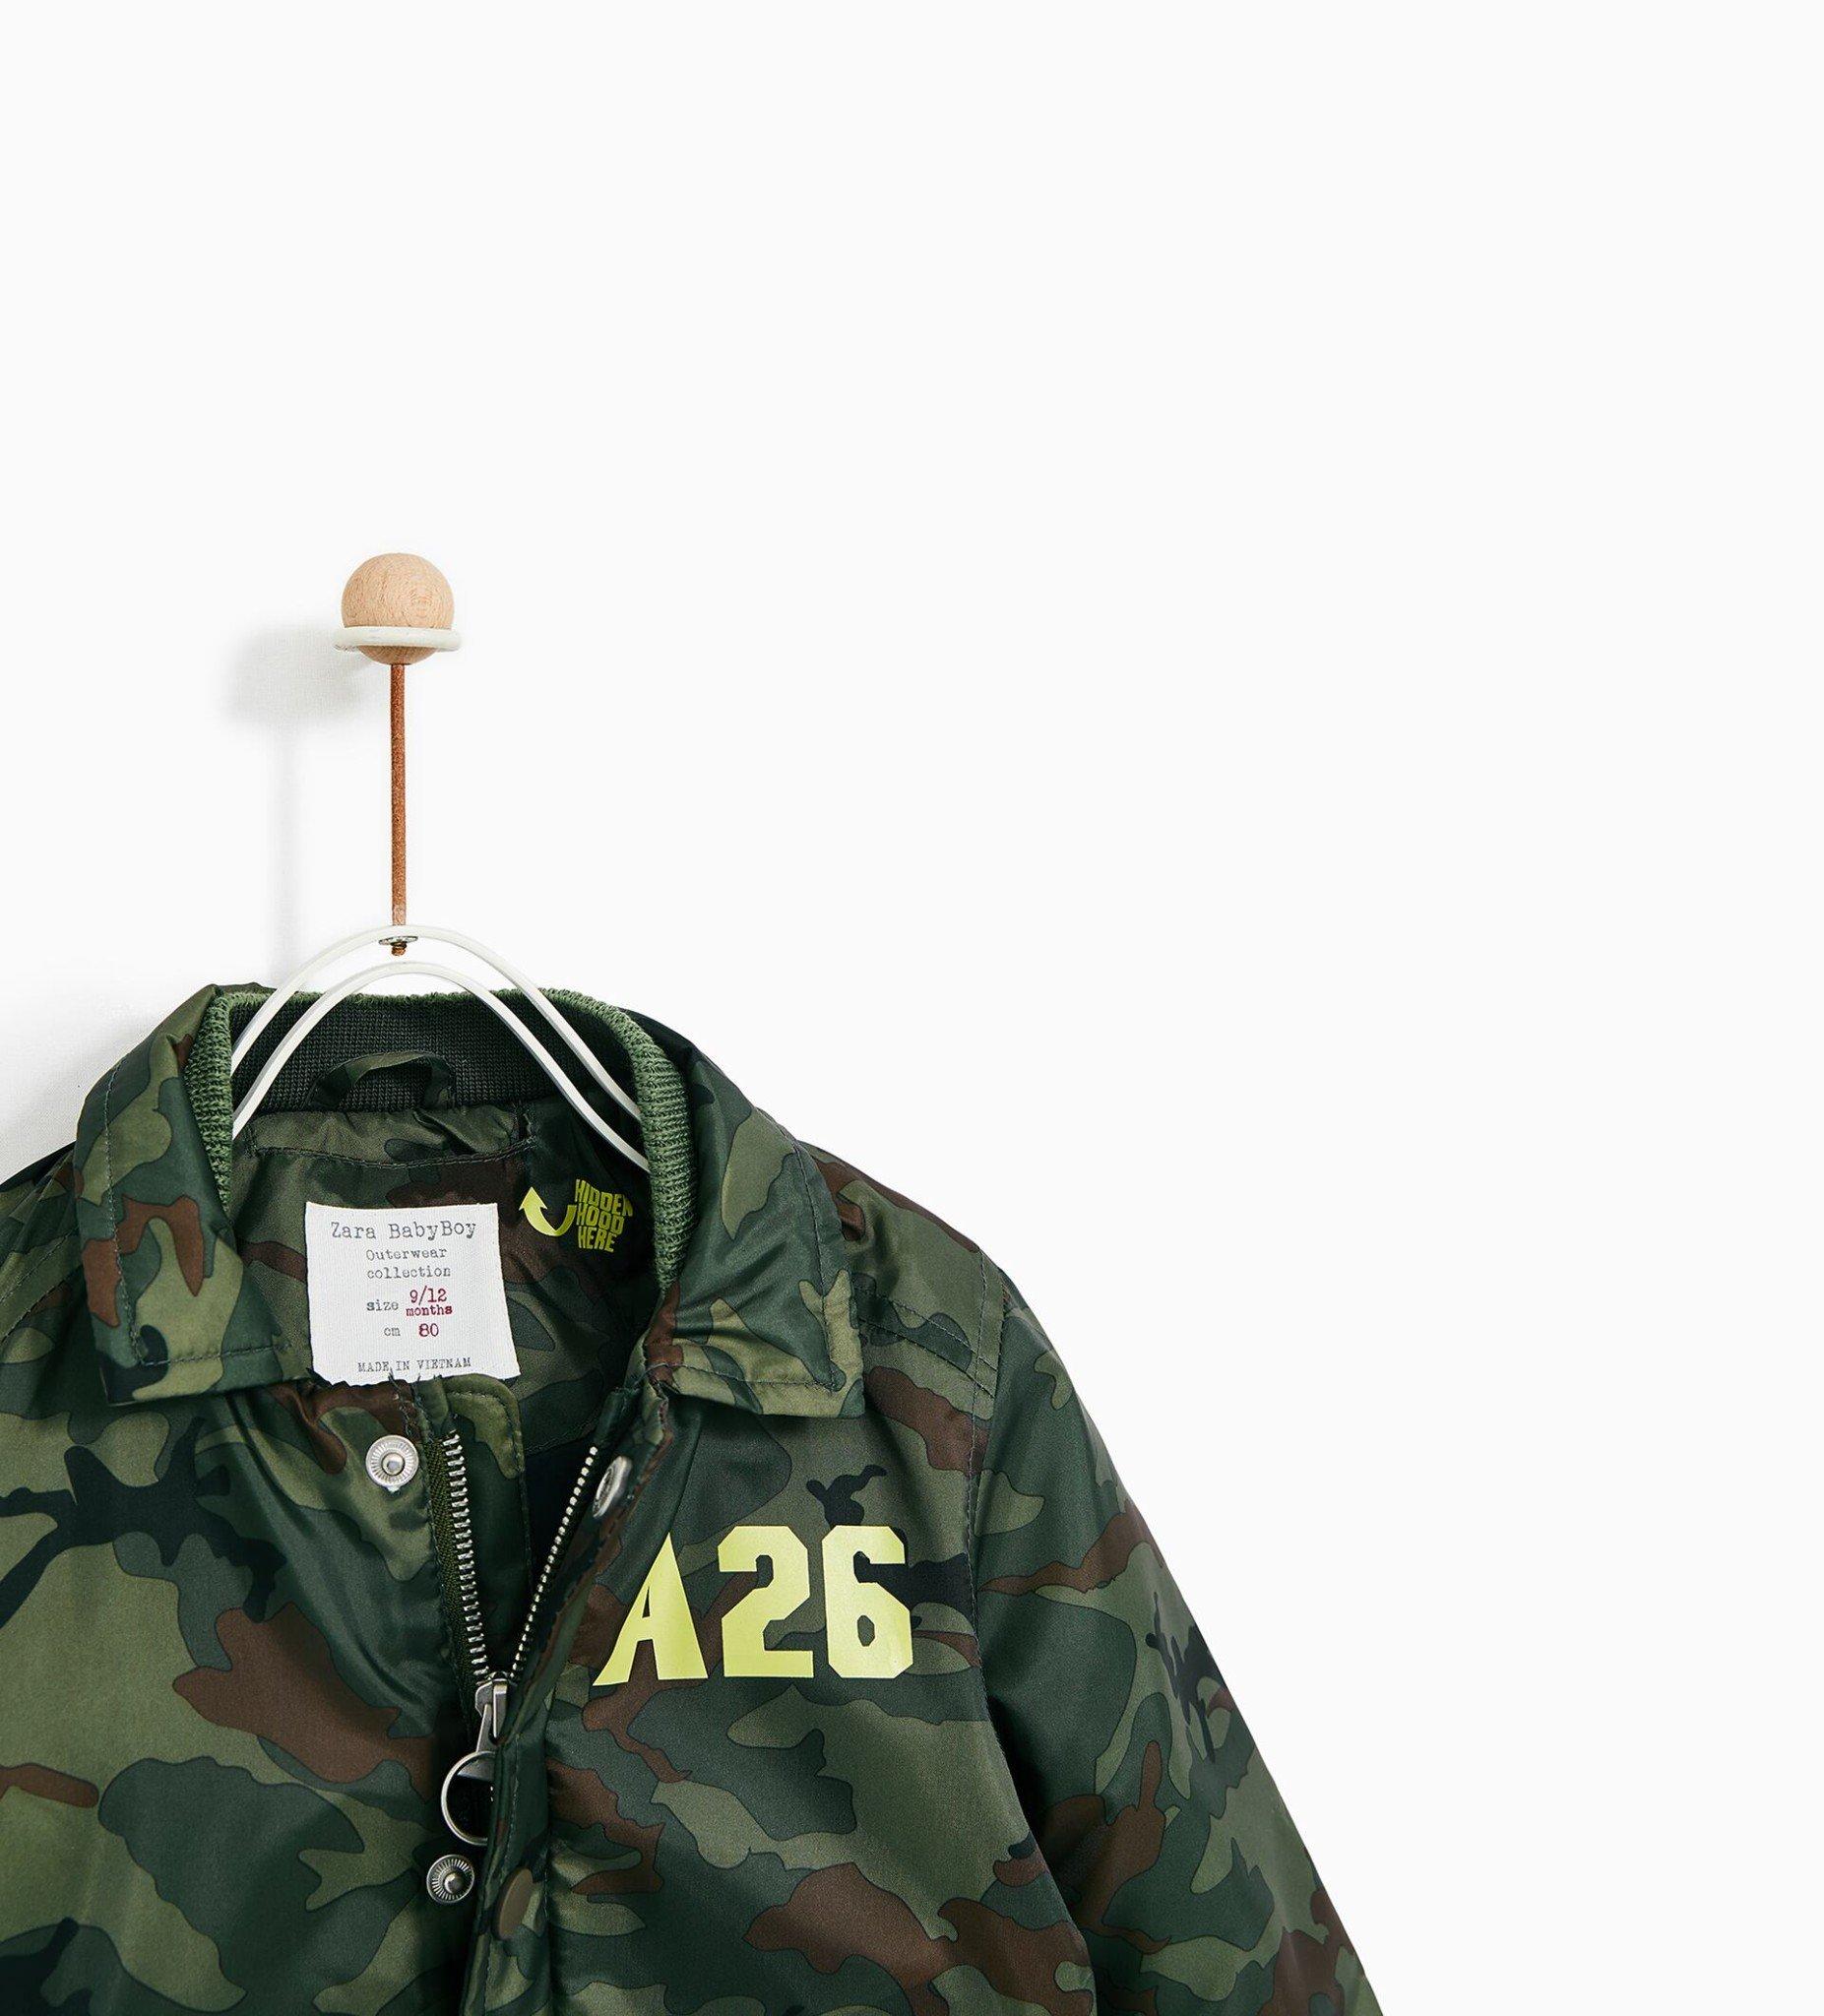 [14-19kg] Áo Khoác Phao Zara A6 [Boy] - Rằn Ri